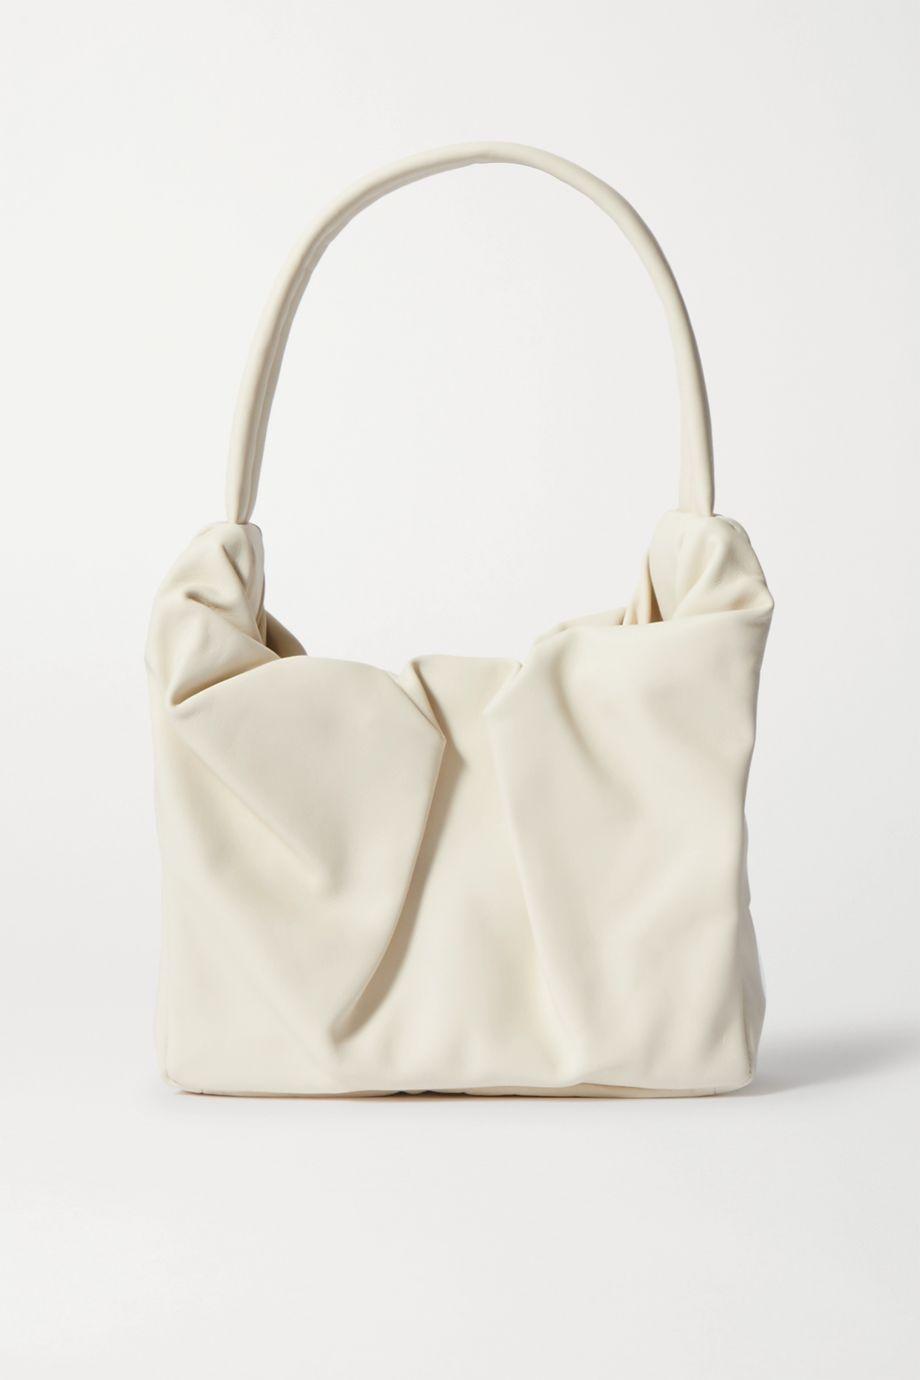 STAUD Felix gathered leather shoulder bag